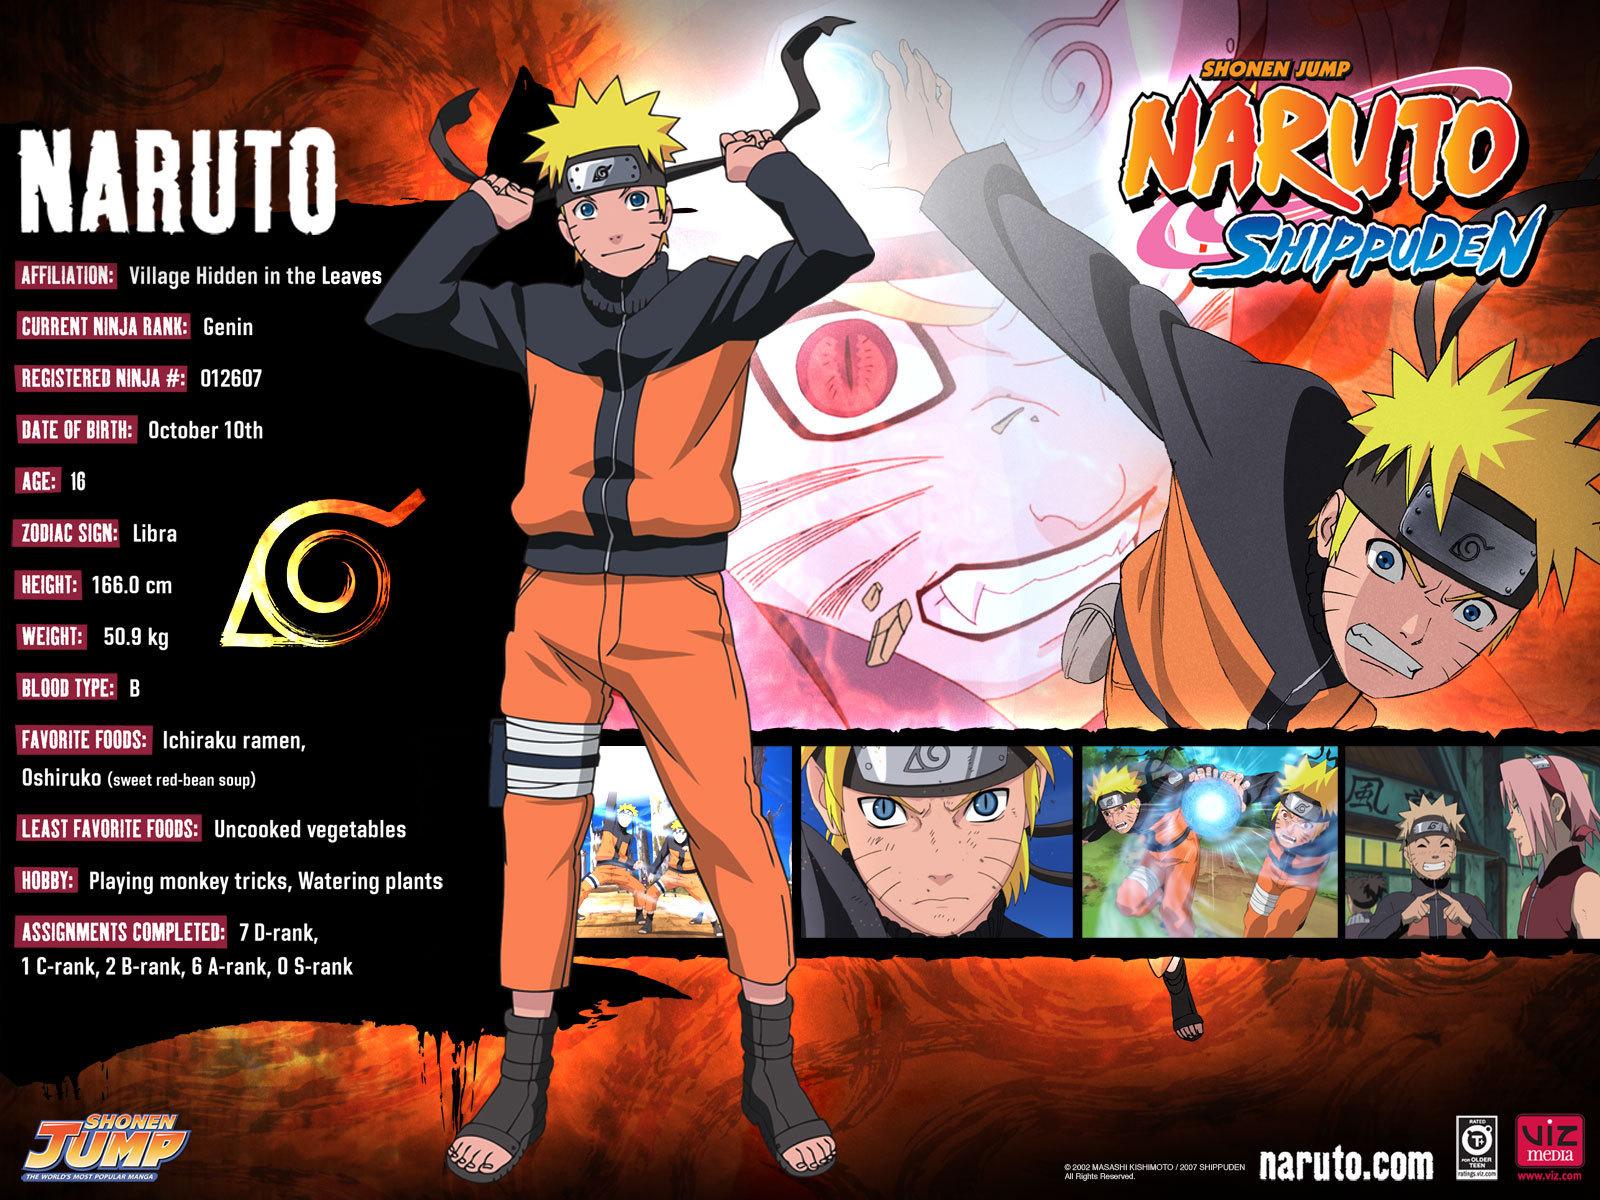 Foto Naruto Shippuden Aneka Informasi Berguna Dan Terbaru